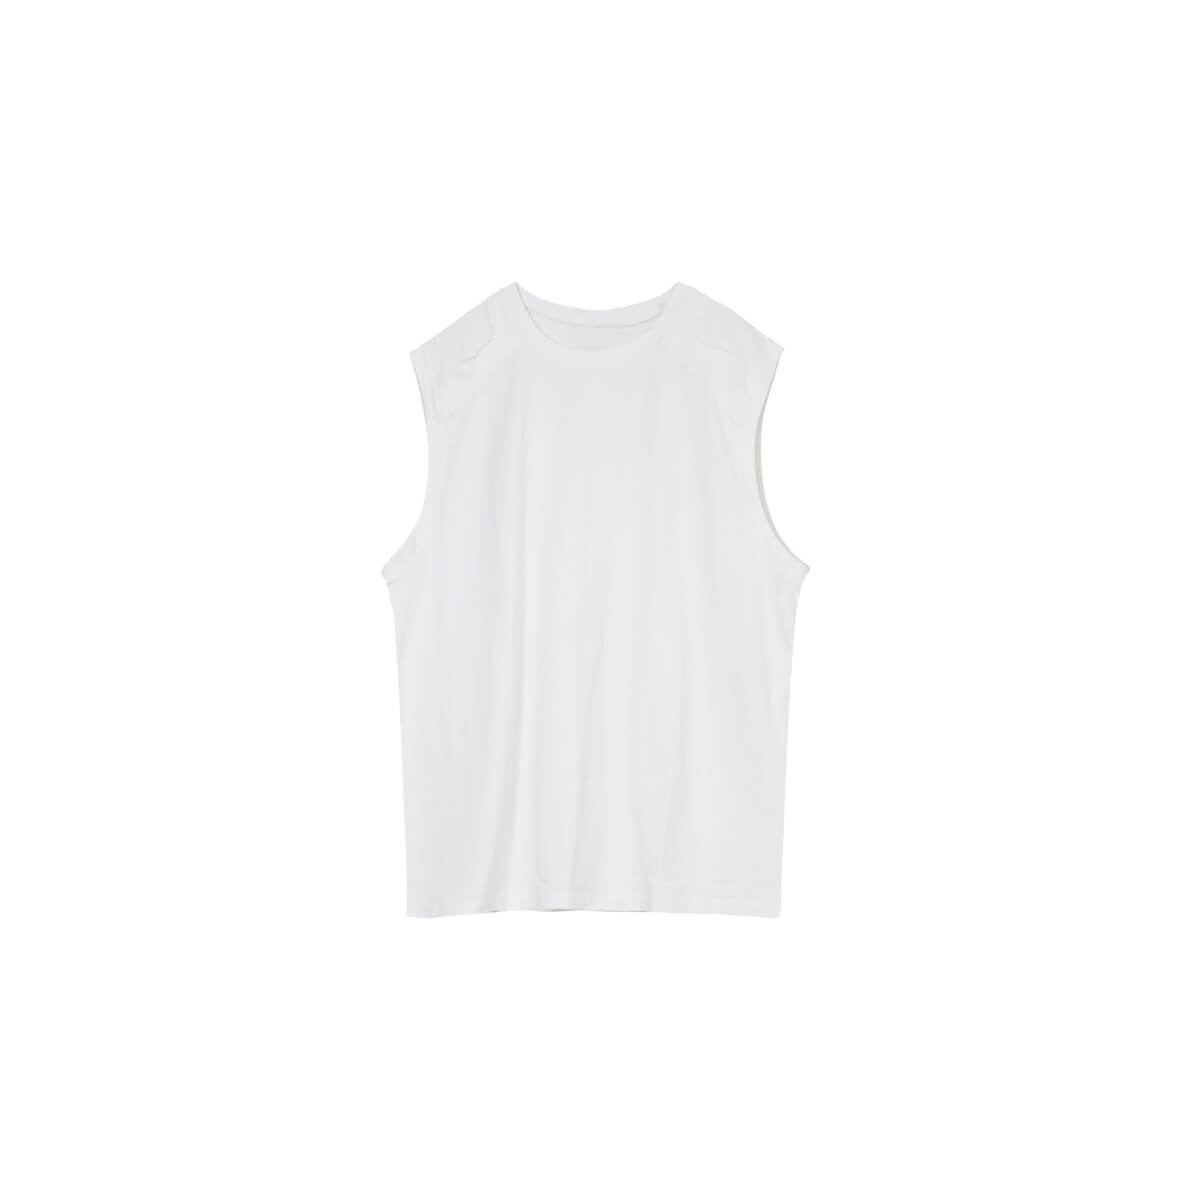 Майка Cui Layout Studio Tank Top Ripped Shoulders White